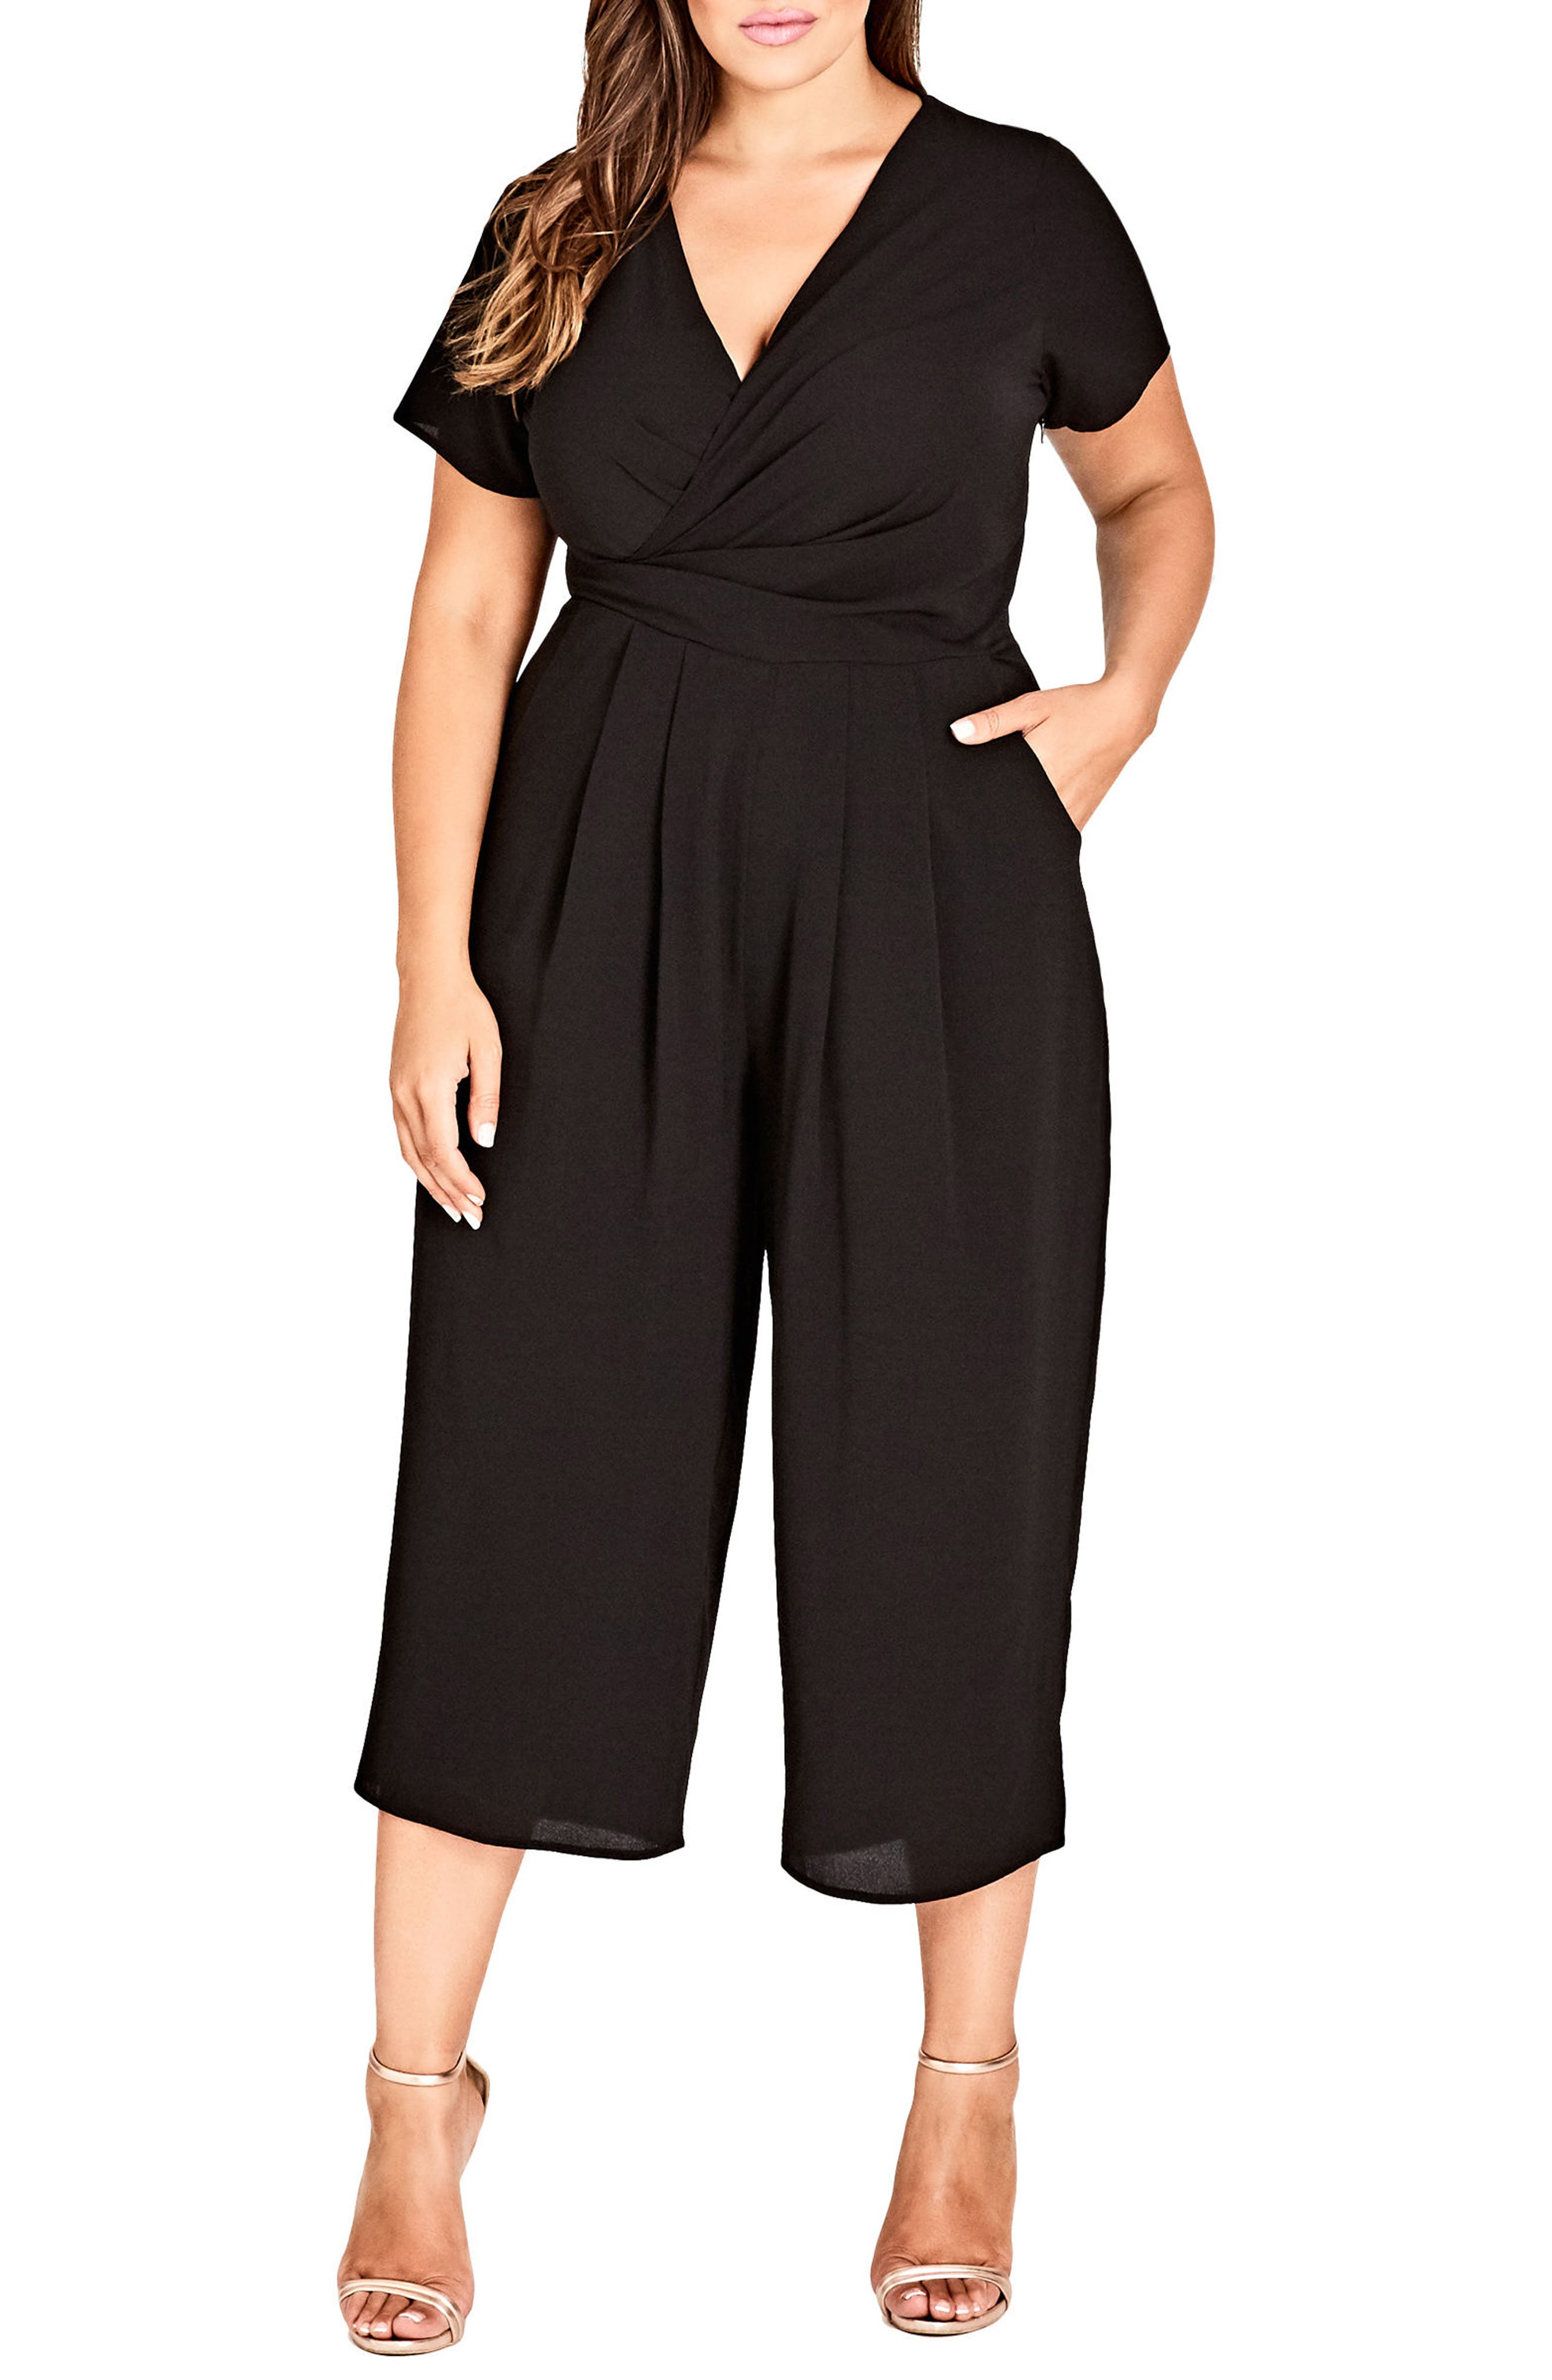 Asplice Jumpsuit,                         Main,                         color, BLACK